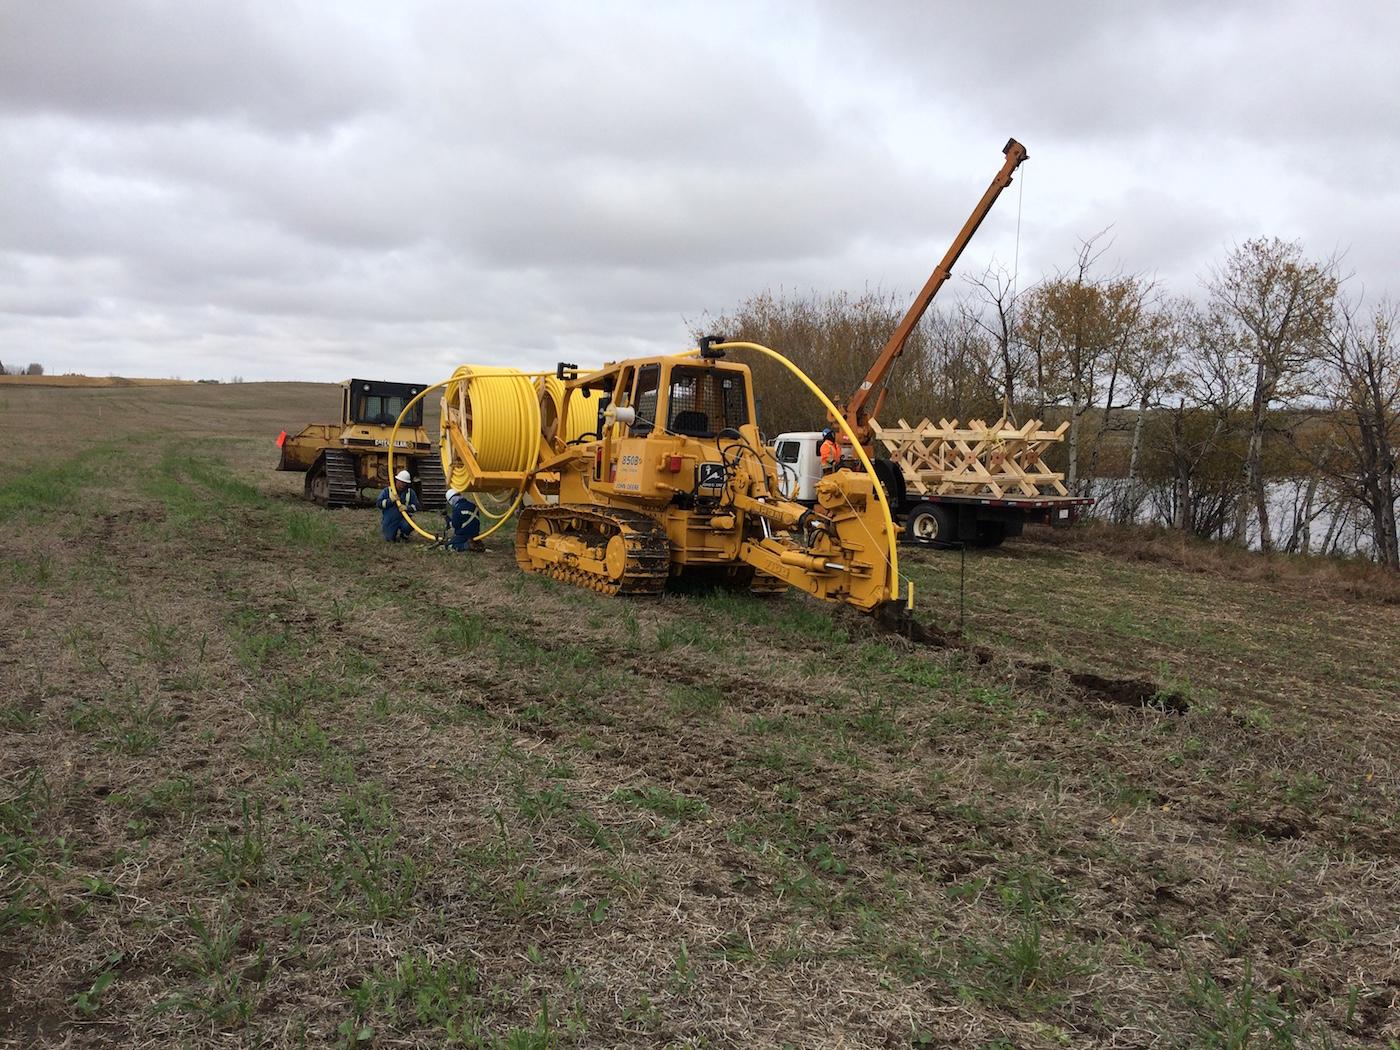 Plowing 7